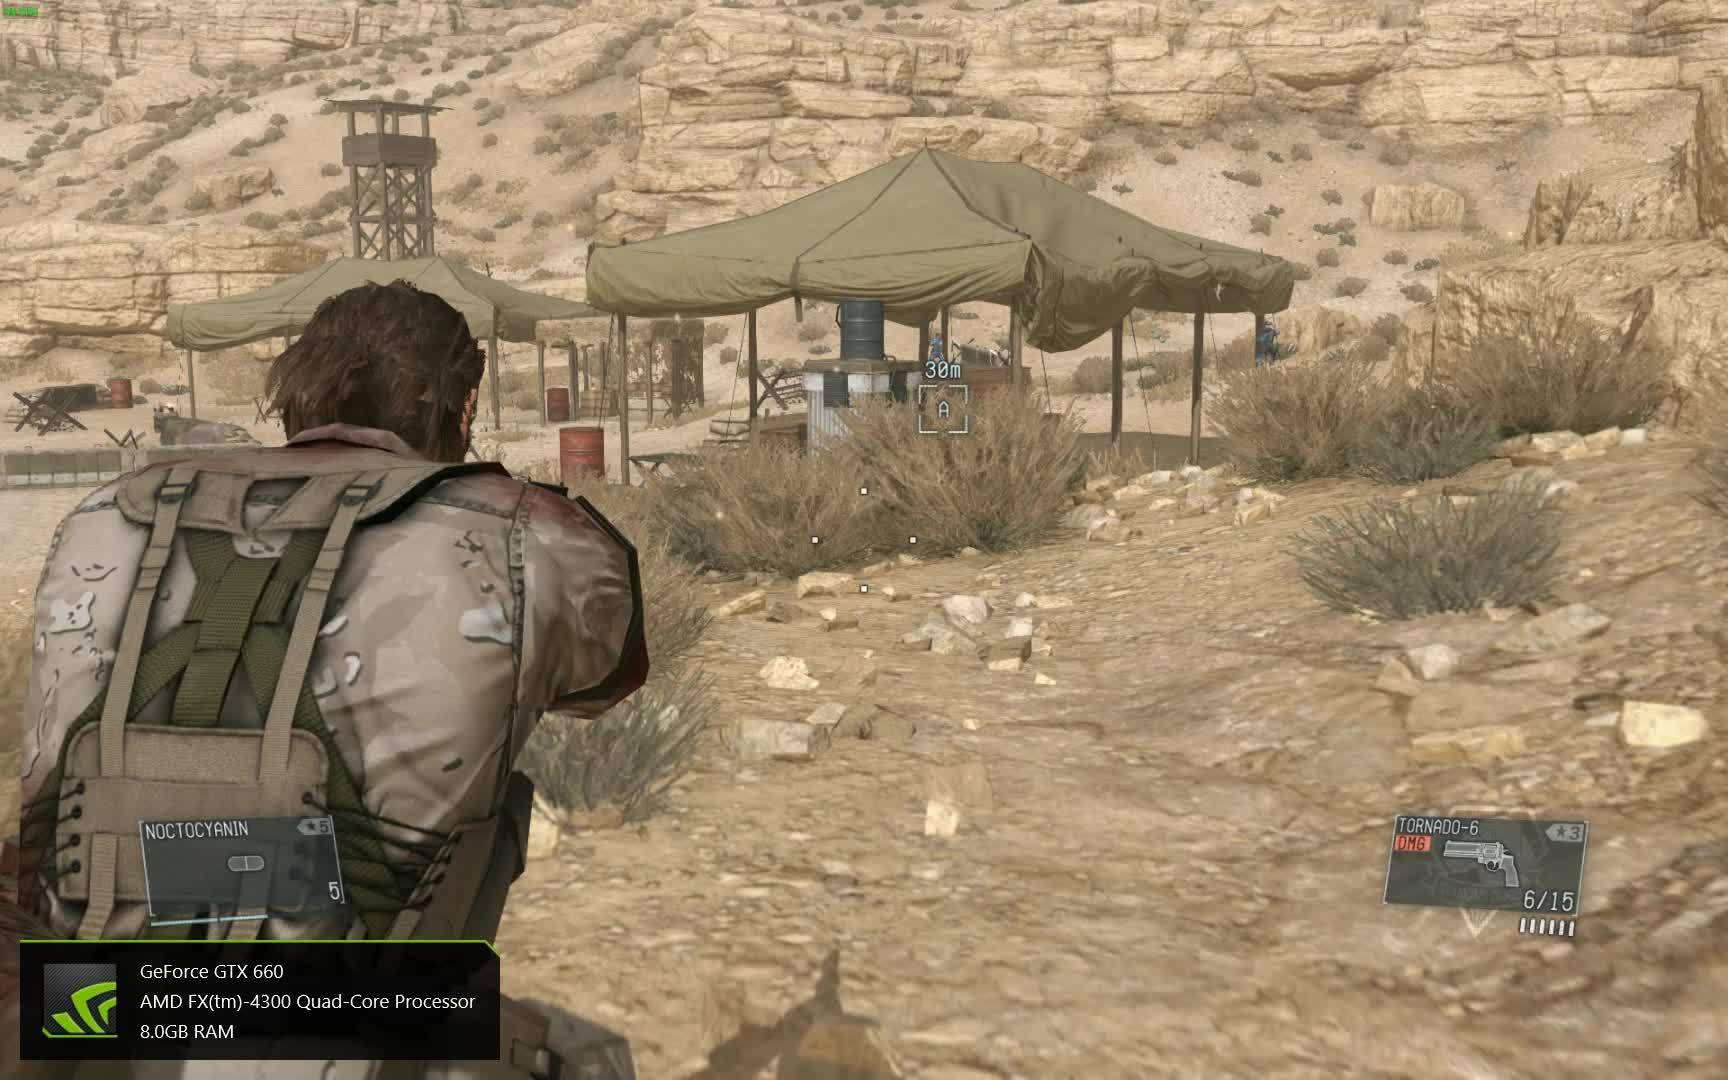 metalgearsolid, metalgearsolidv, mgsv, The Tornado-6 (Metal Gear Solid V: The Phantom Pain) GIFs